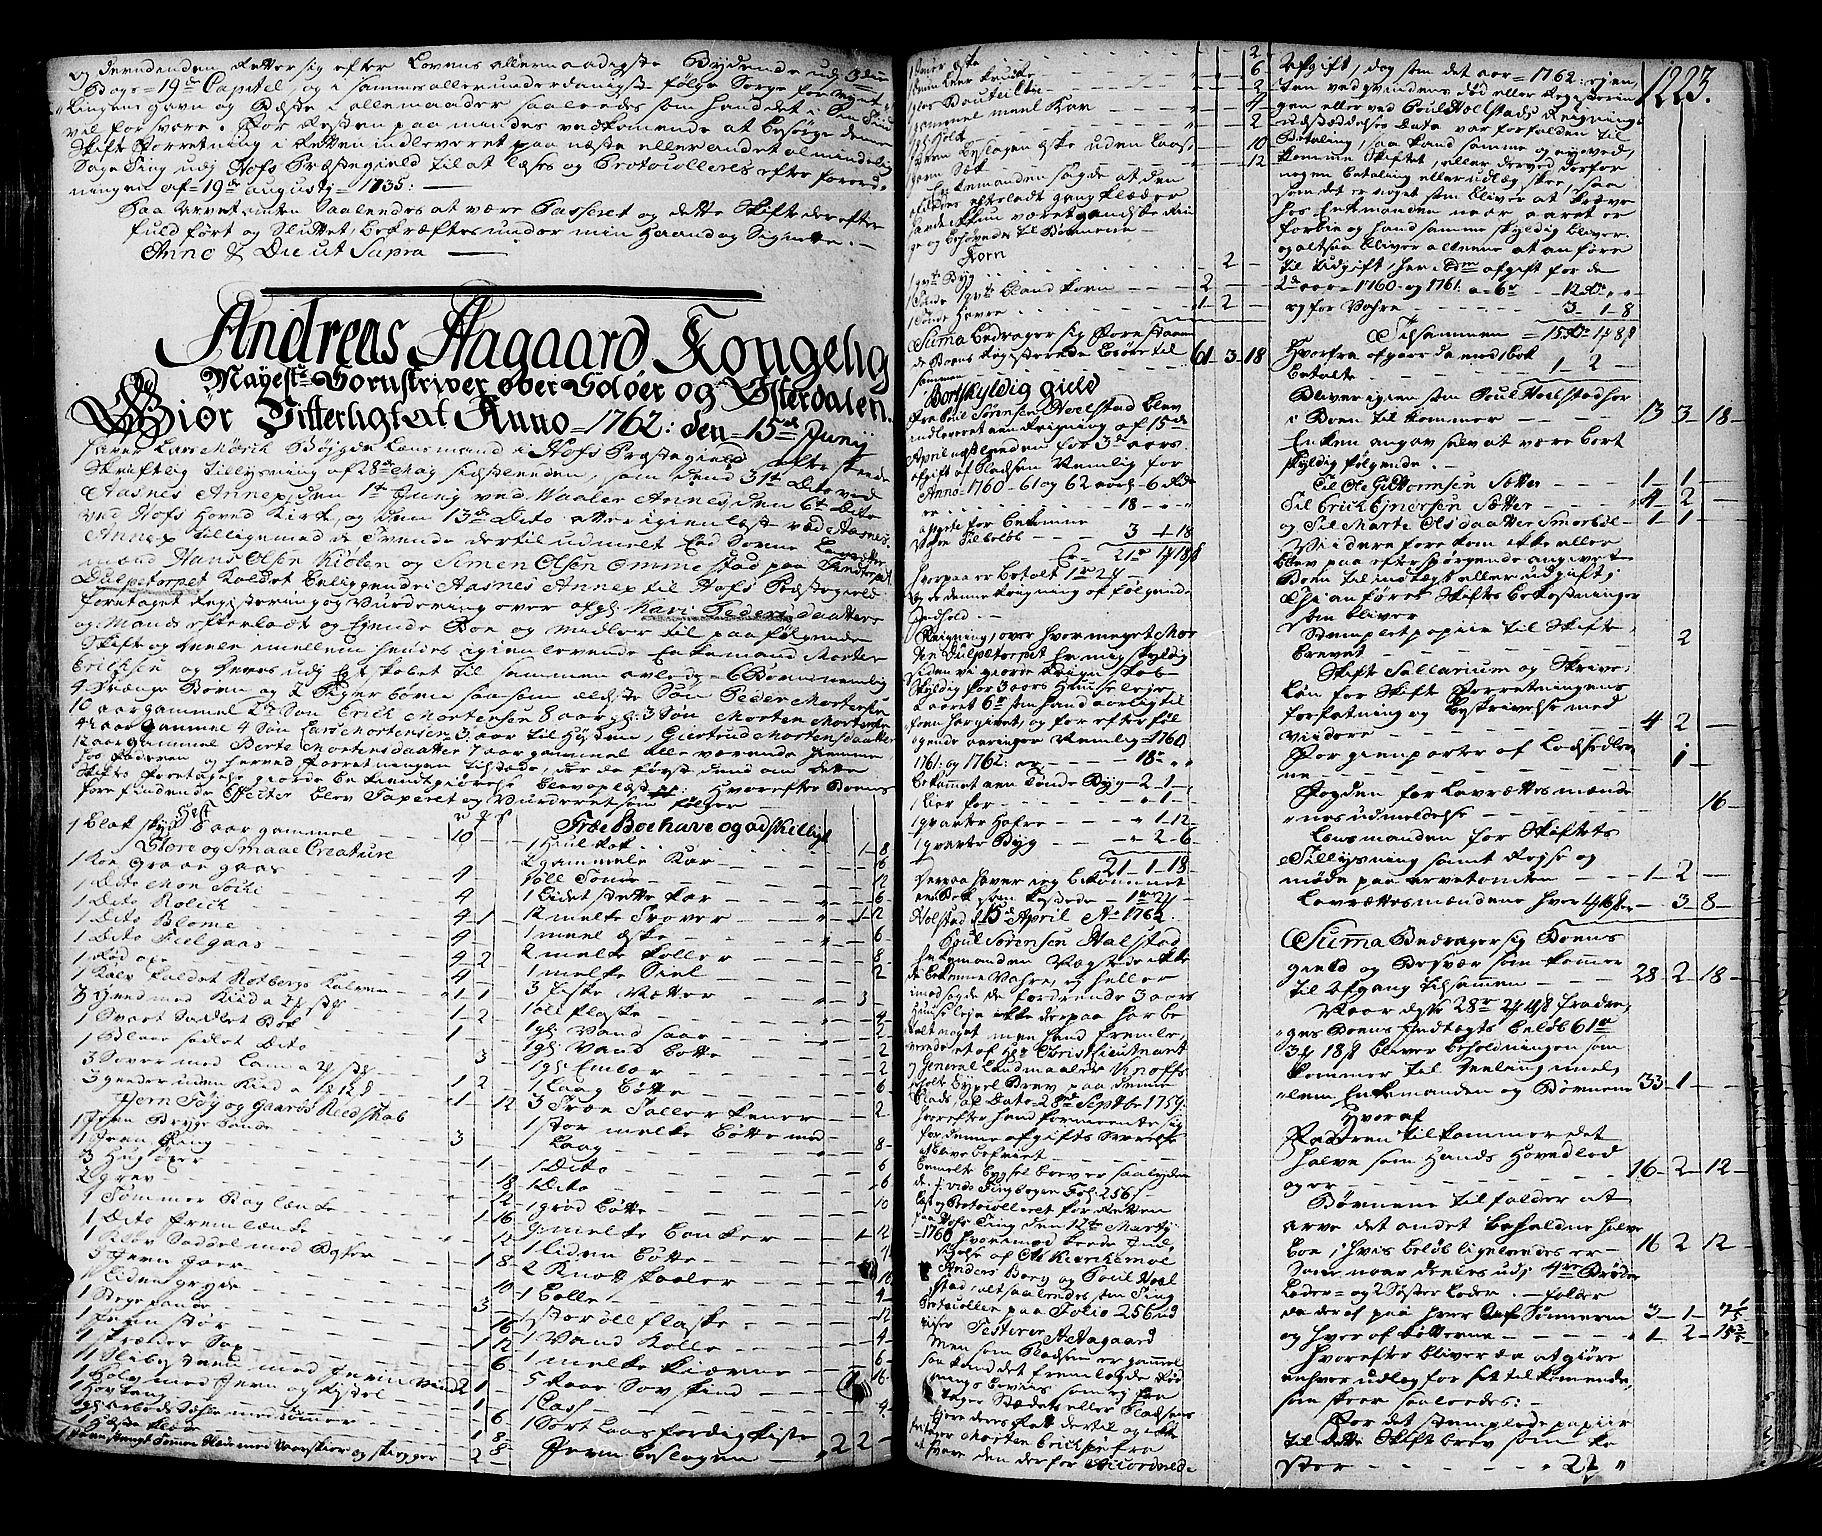 SAH, Solør og Østerdalen sorenskriveri, J/Ja/L0012A: Skifteprotokoll, 1757-1764, s. 1222b-1223a